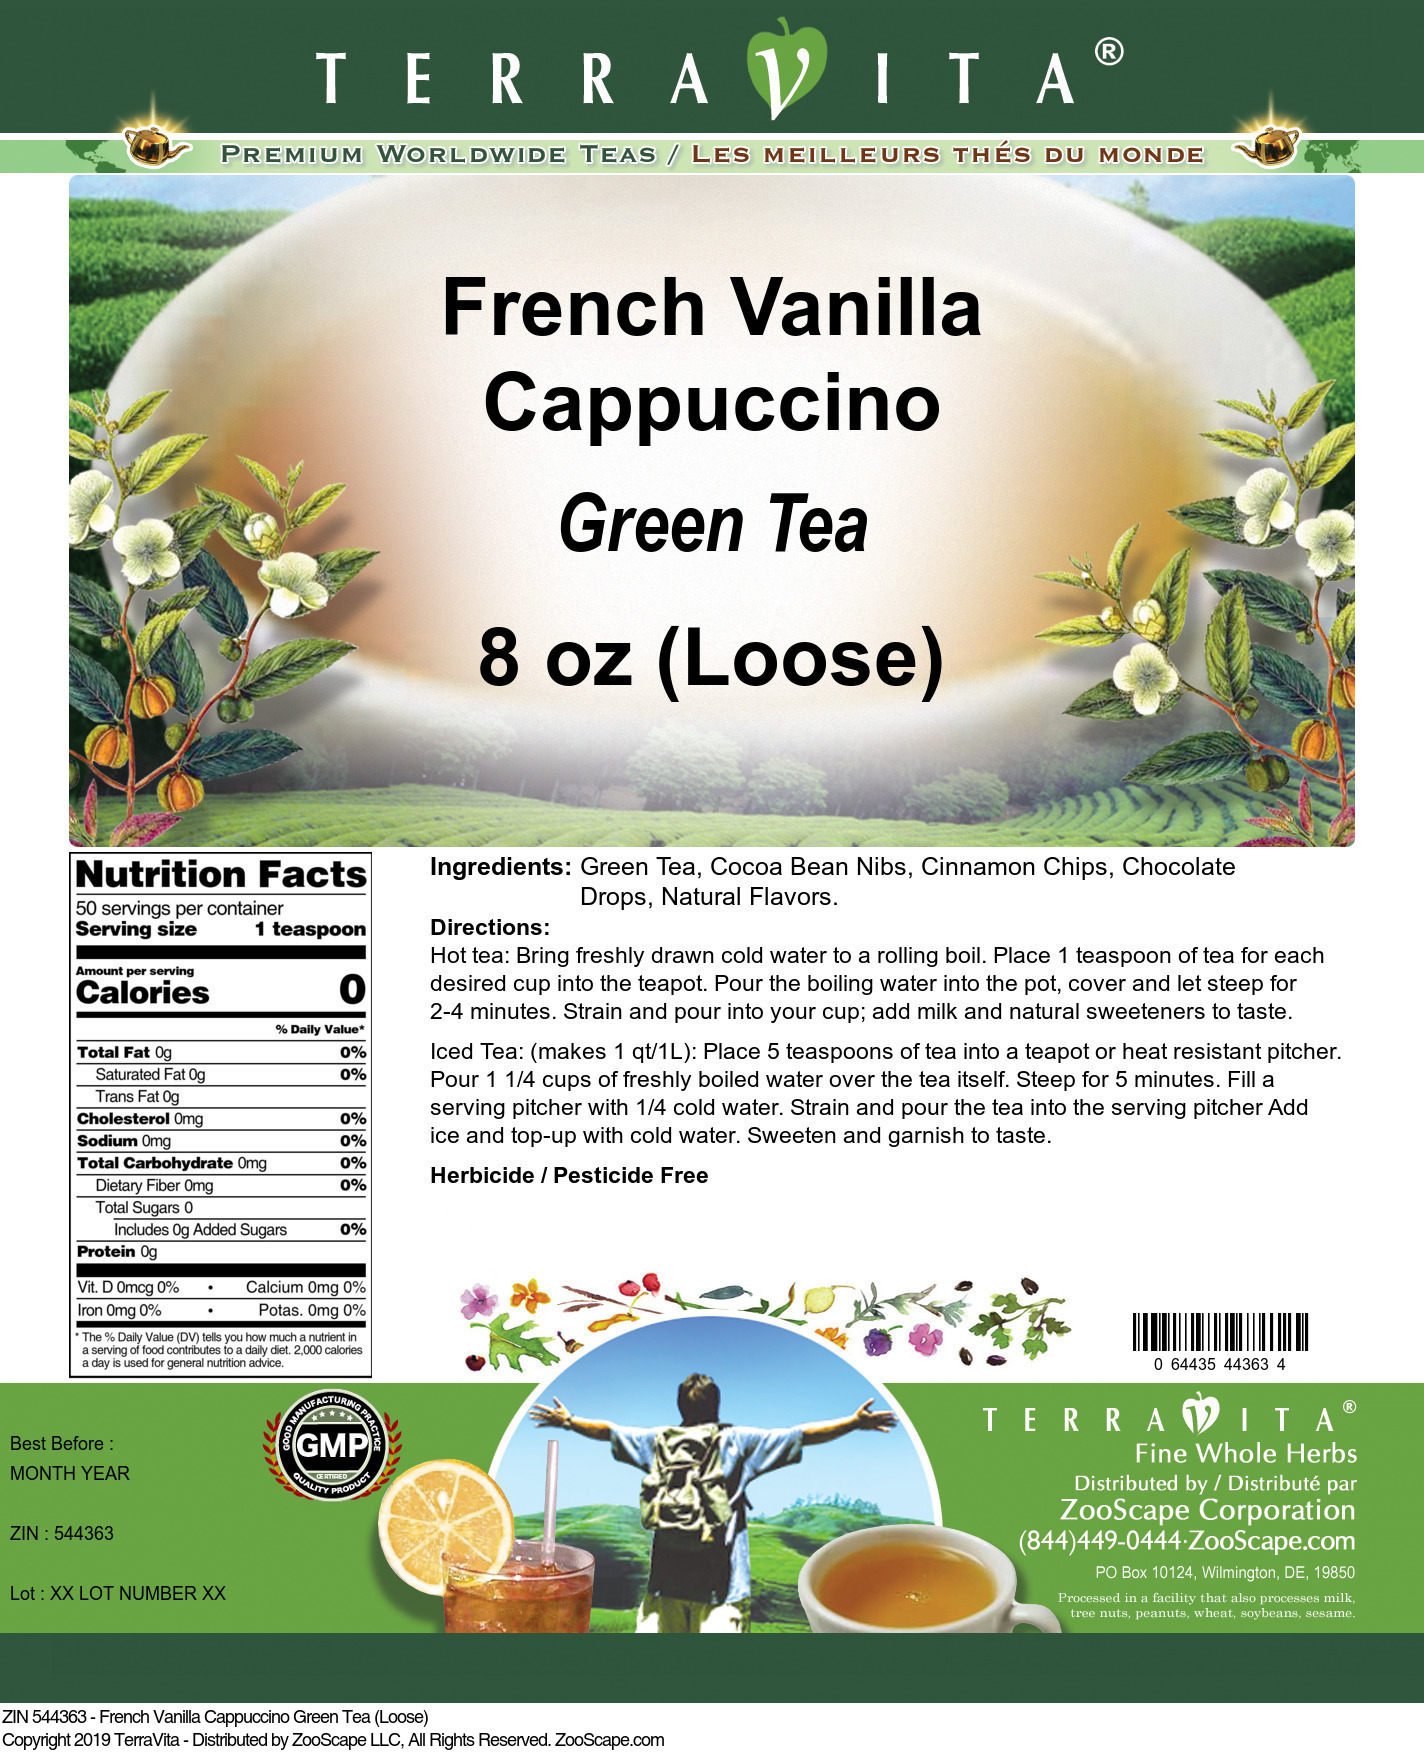 French Vanilla Cappuccino Green Tea